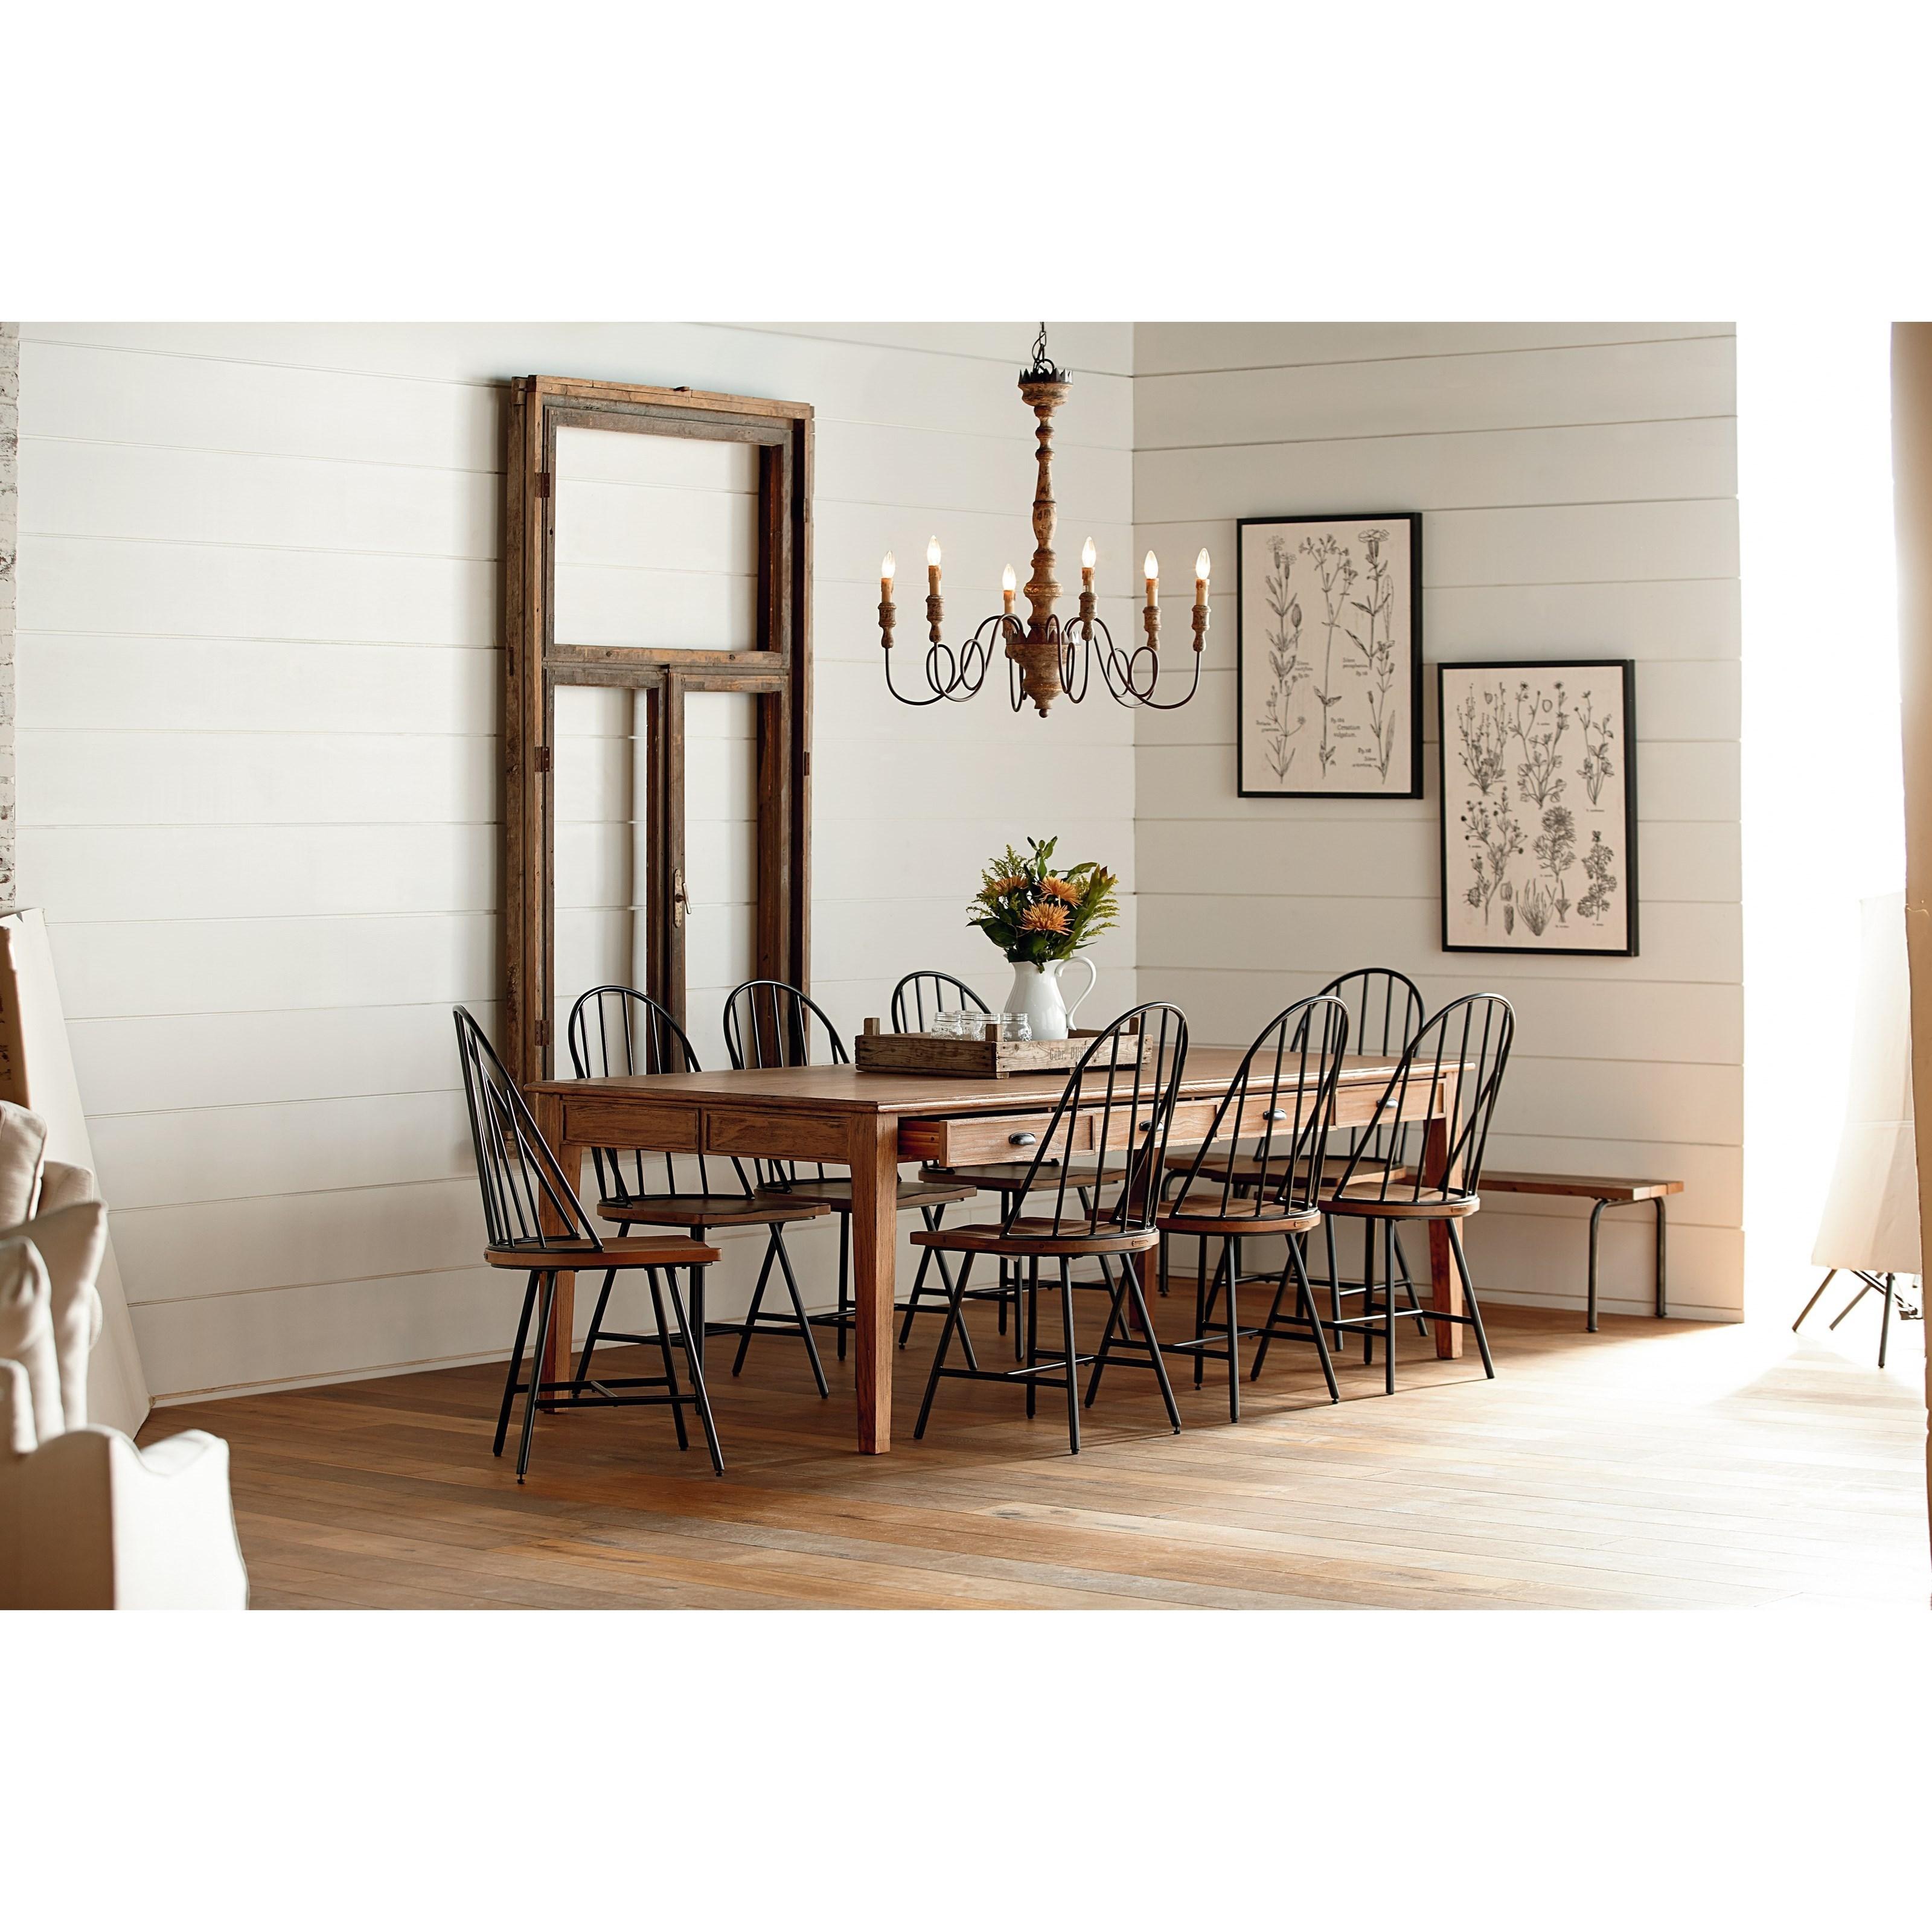 Magnolia home by joanna gaines farmhouse 10 piece dining for Farmhouse dining set